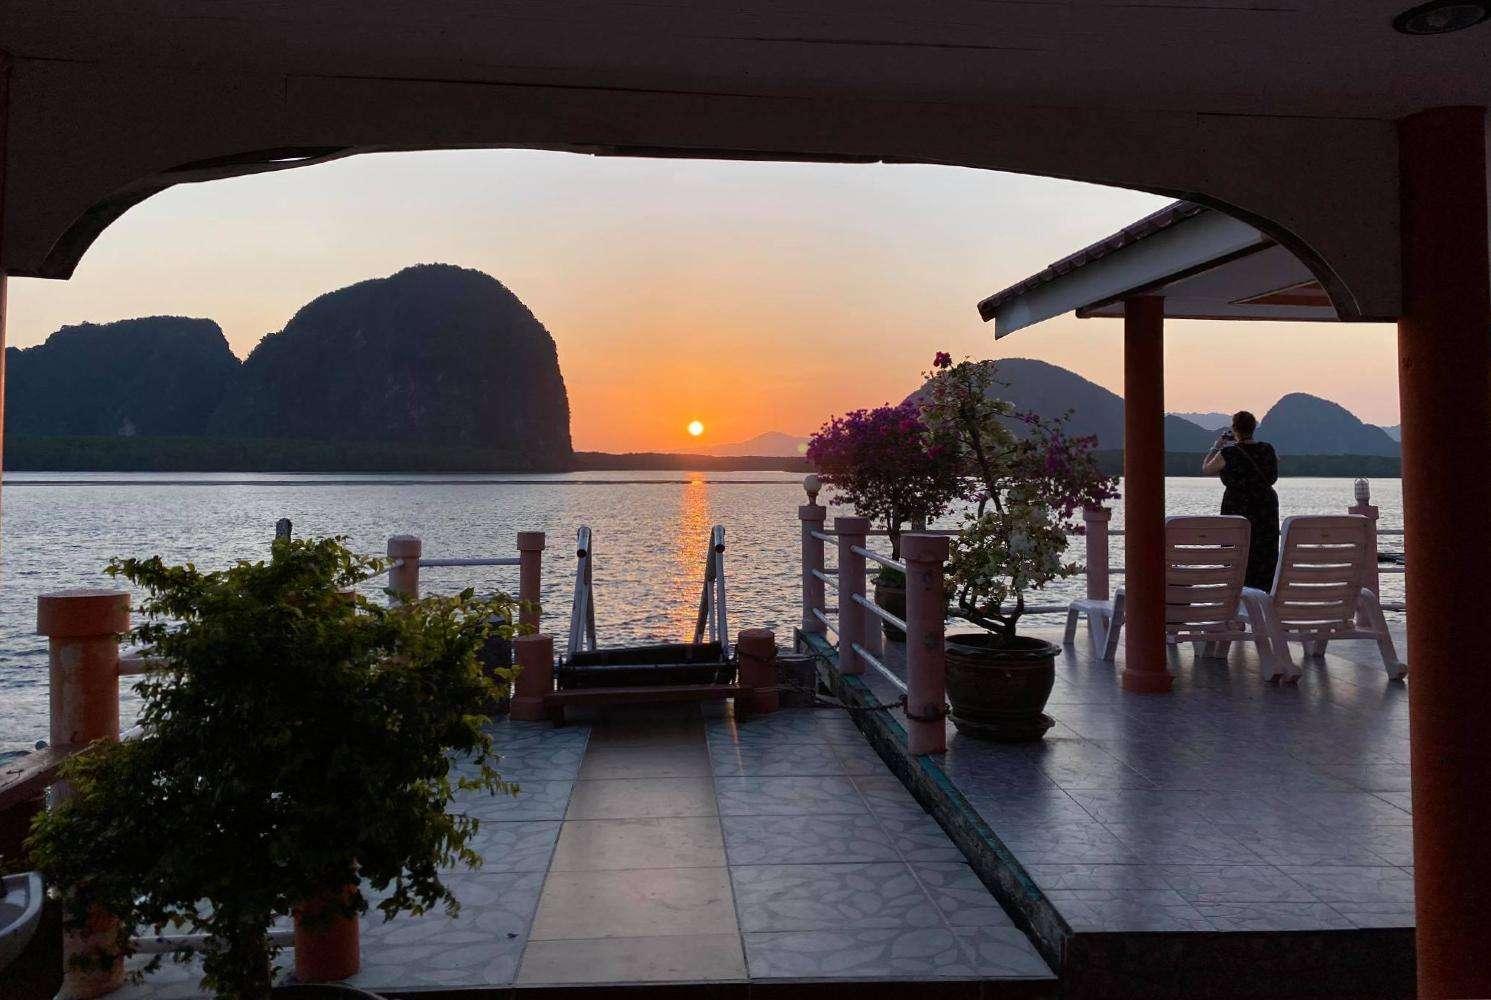 View from James Bond Bungalow on Koh Panyee in Phang Nga Bay, Thailand